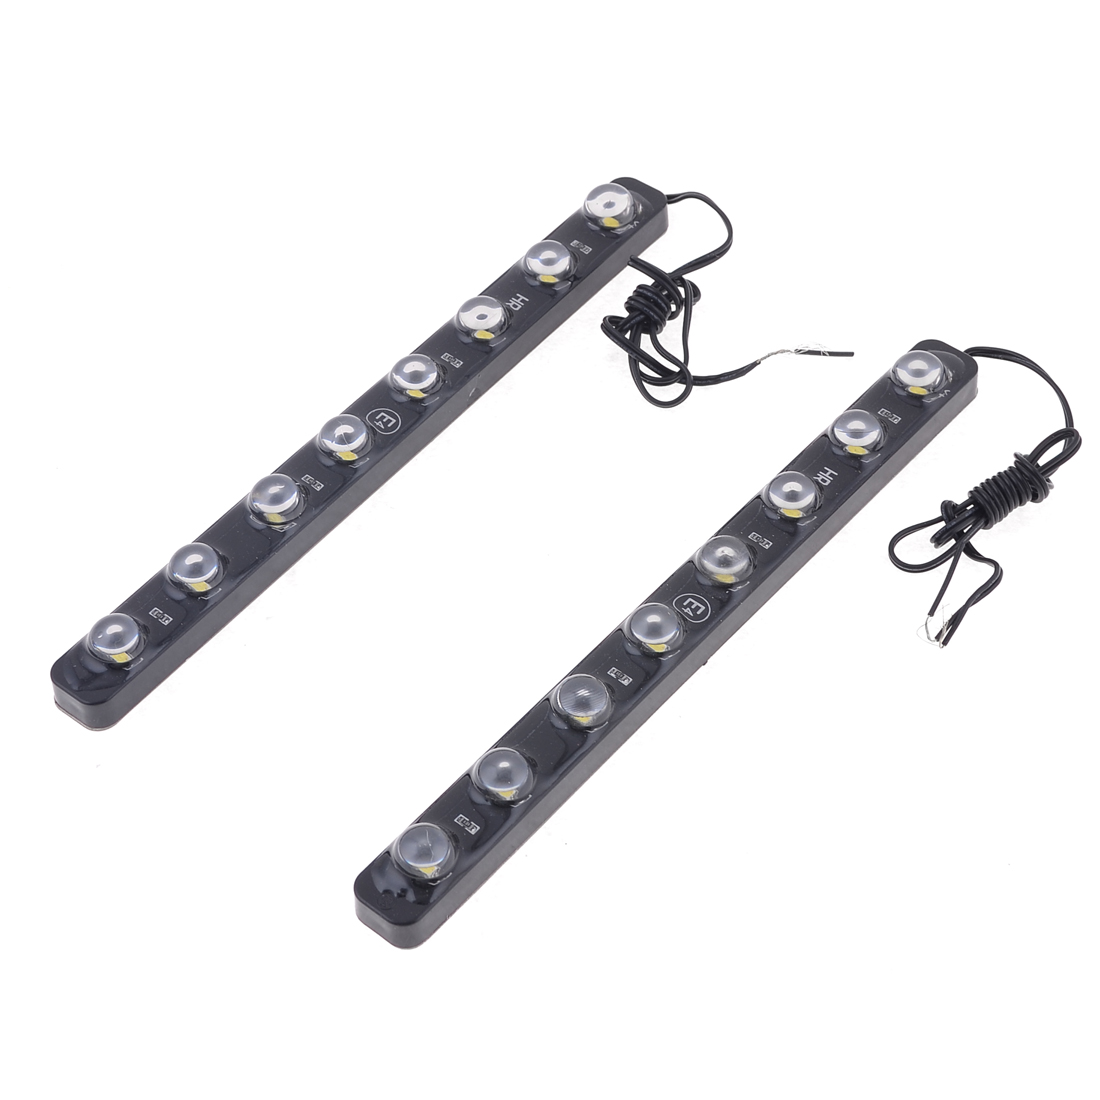 2 Pcs Auto Car Self Adhesive White 8 LED Lamp Daytime Running Lights Black